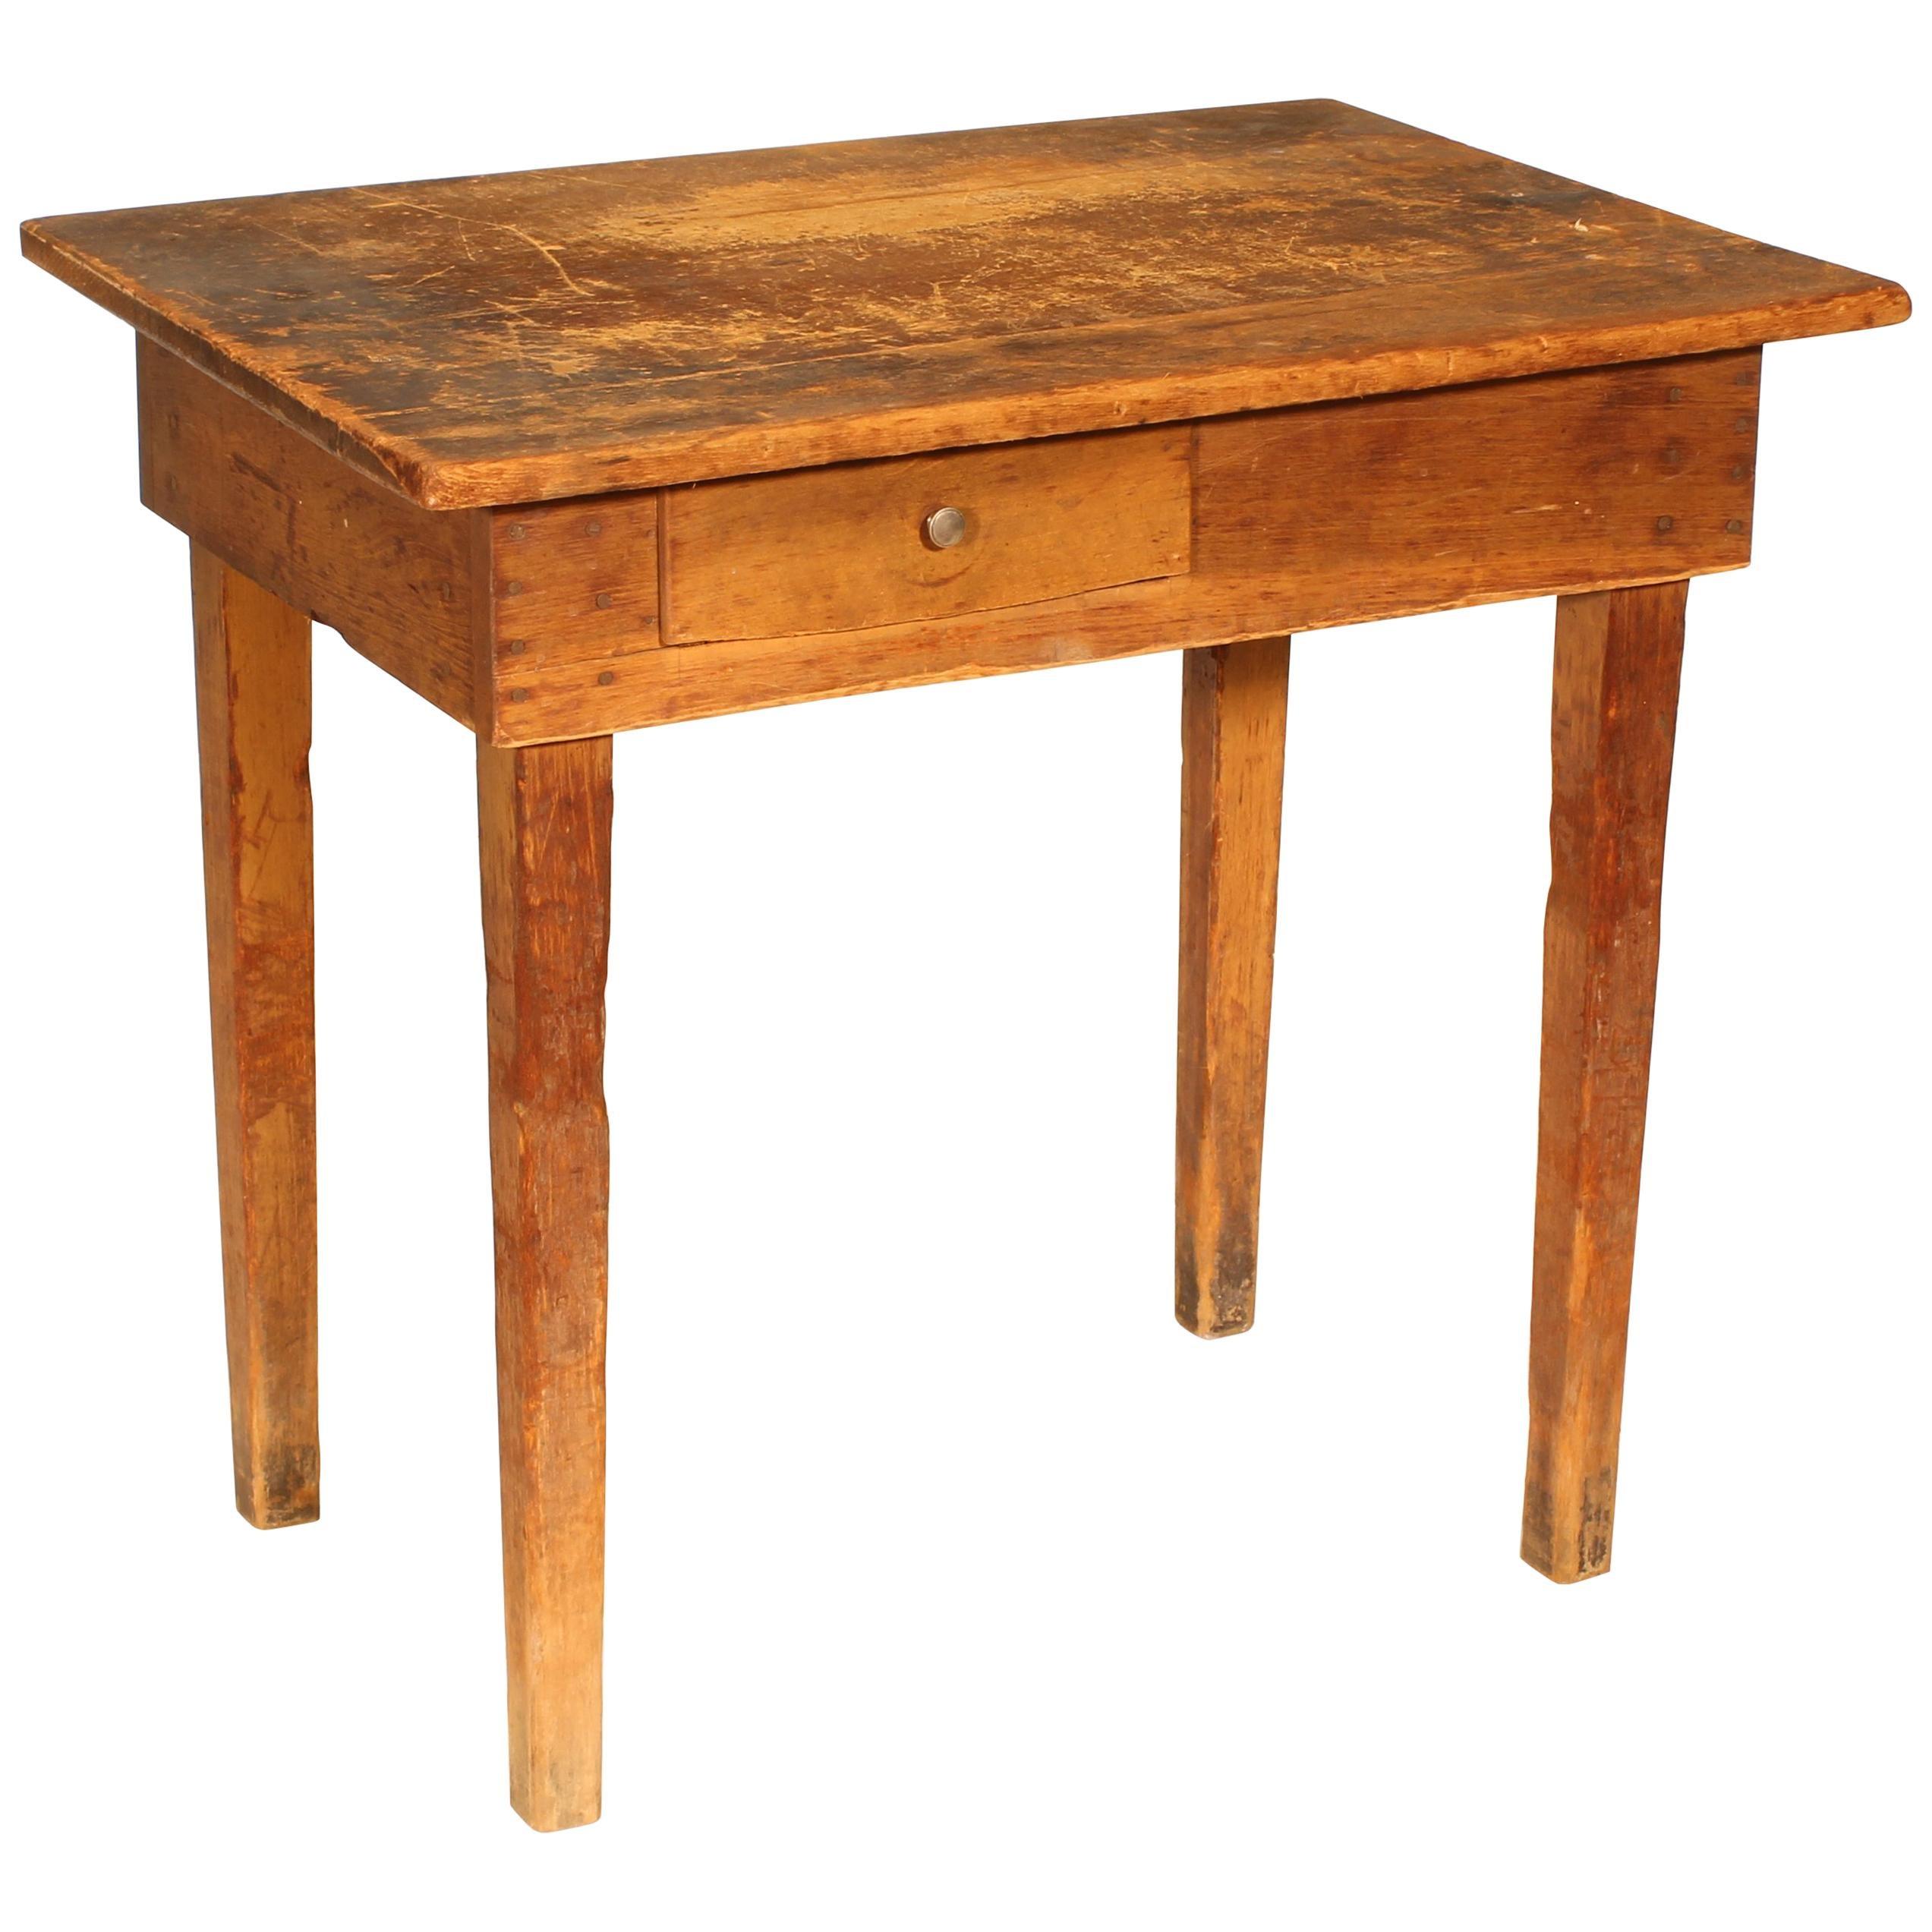 Surprising Antique And Vintage School Desks 64 For Sale On 1Stdibs Home Interior And Landscaping Fragforummapetitesourisinfo